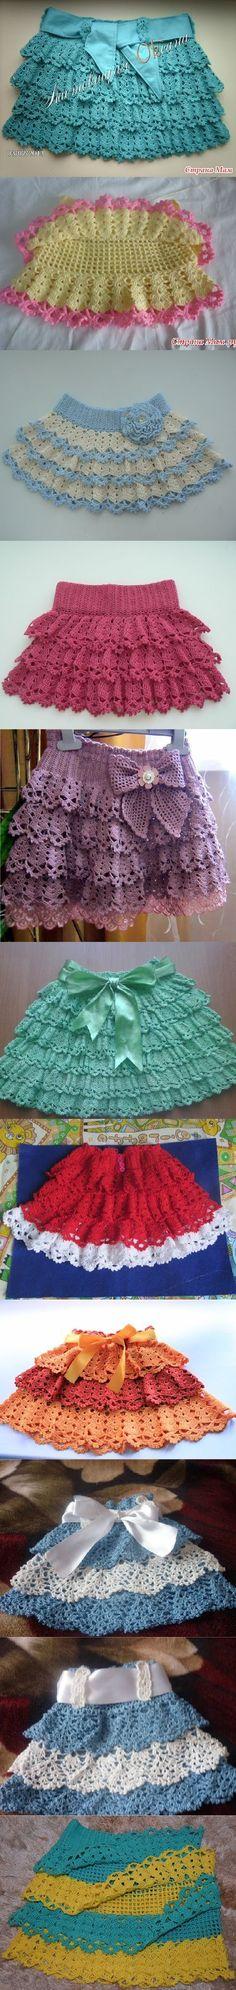 #skirt #design #pattern #crochet #knit #video #instruction